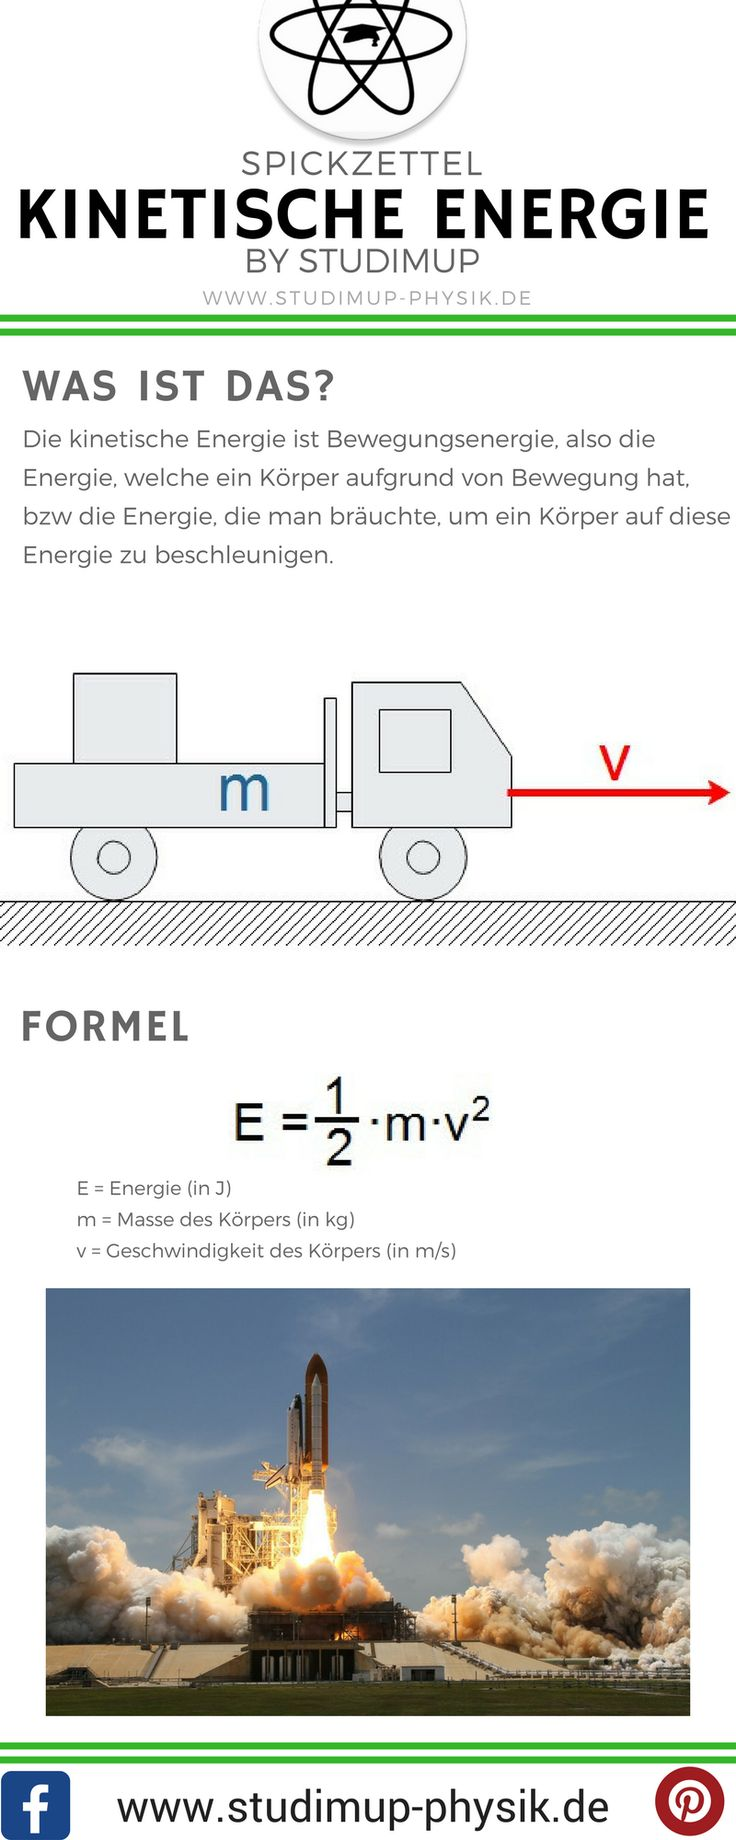 32 best Physik Spickzettel images on Pinterest | Cheat sheets ...